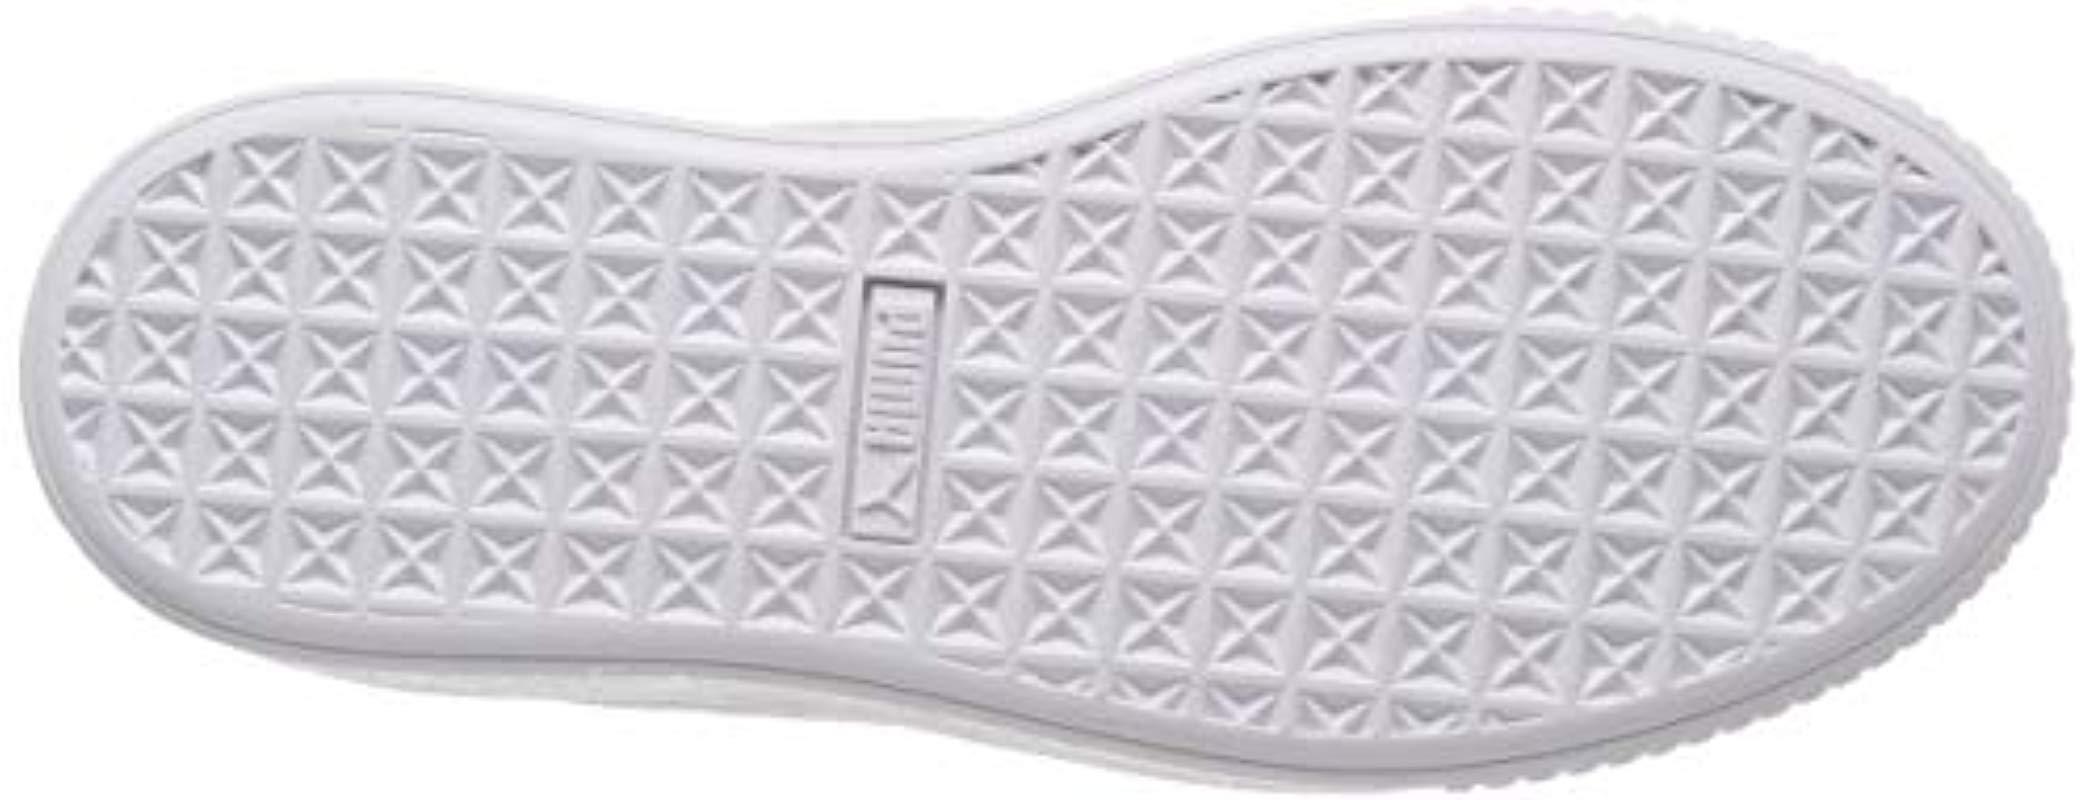 6fd40ad3b895 PUMA Platform Galaxy Wn s Low-top Sneakers in Gray - Lyst